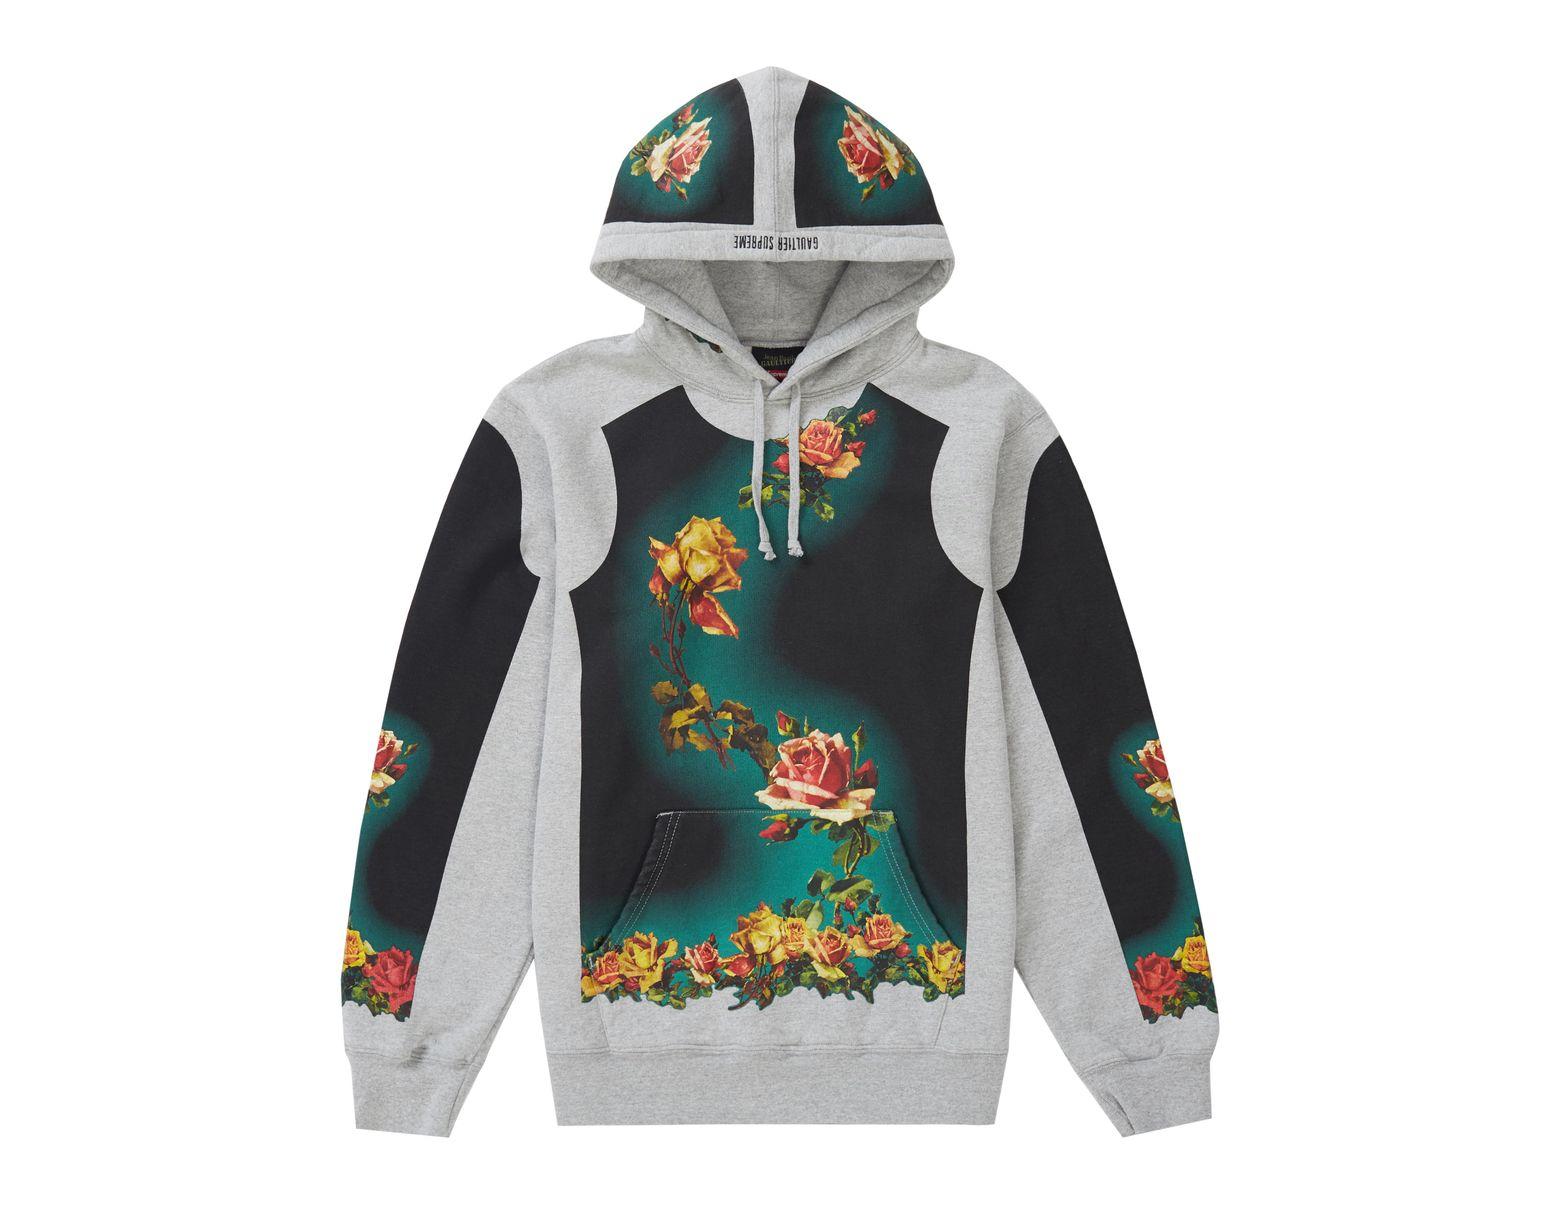 b239cf5c Supreme Jean Paul Gaultier Floral Print Hooded Sweatshirt Heather Grey in  Gray for Men - Save 71% - Lyst